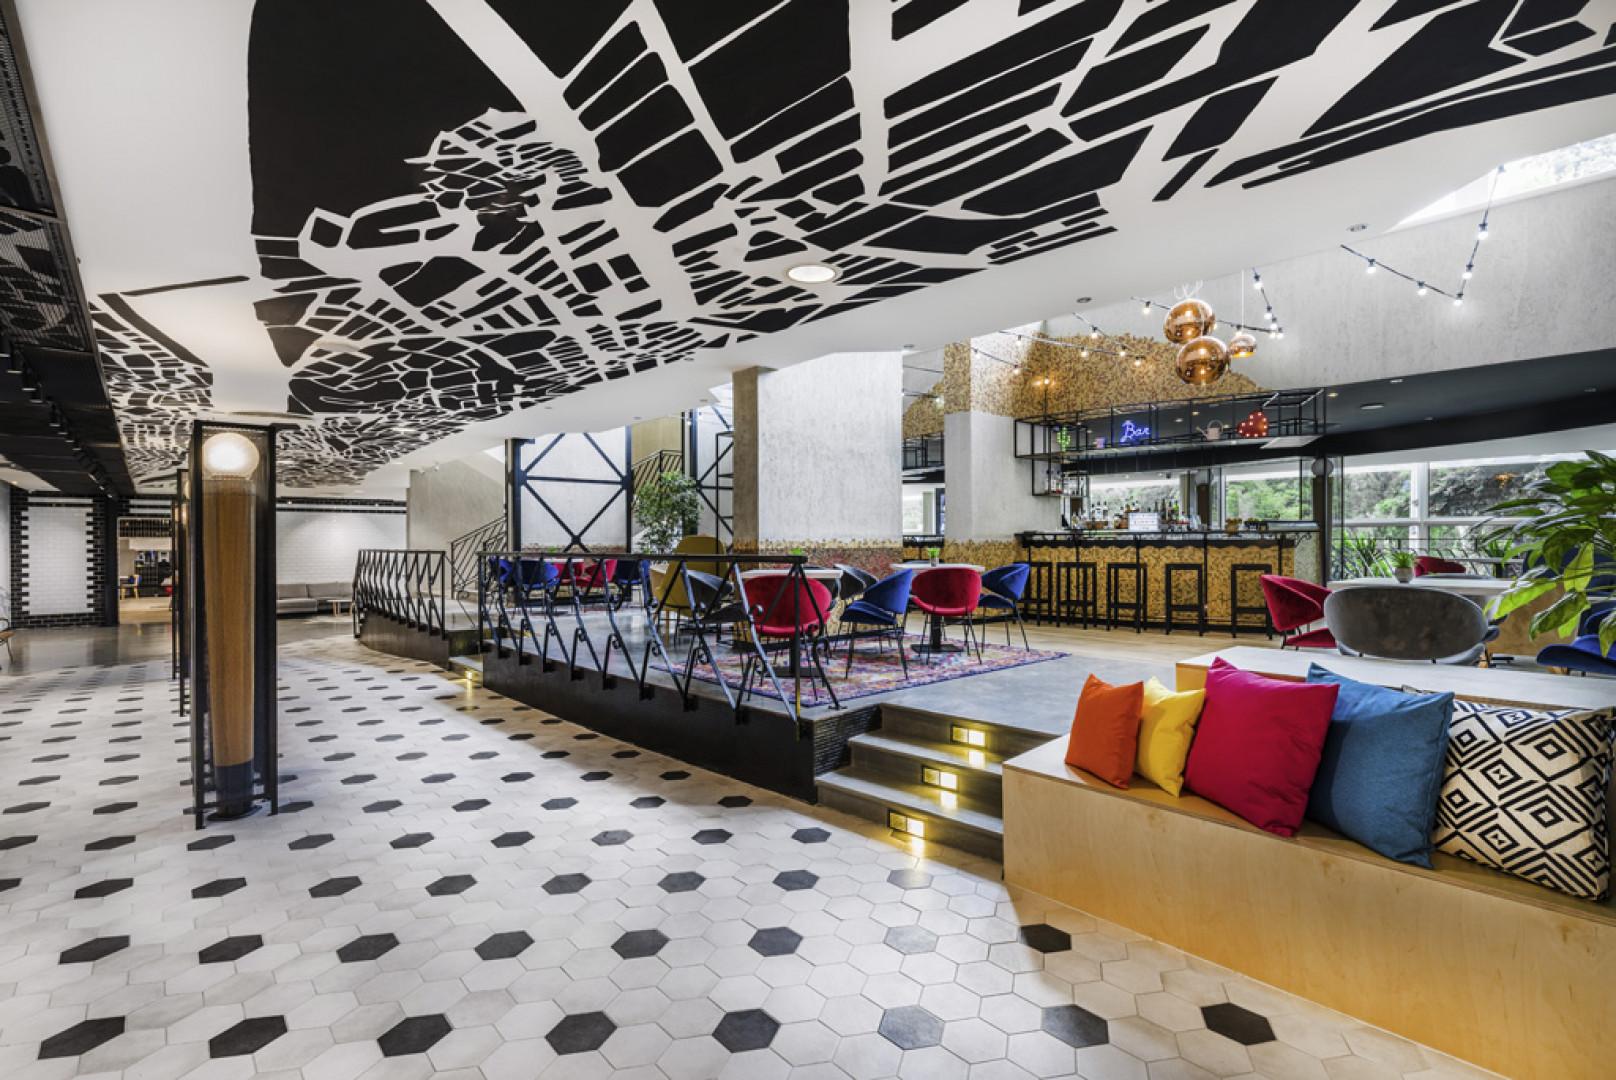 Hotel Mercure, Budapeszt. Fot. Mat. pracowni Tremend